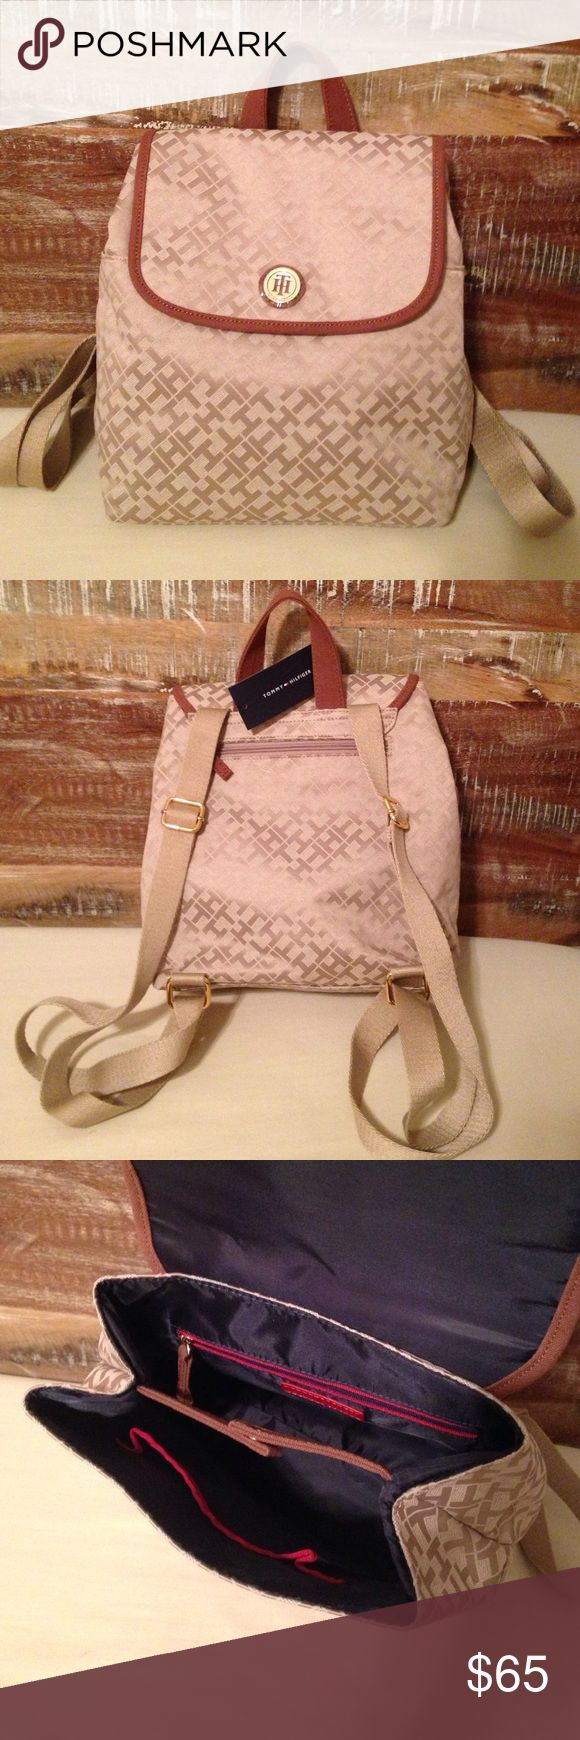 Tommy Hilfiger Beige Backpack NWT Tommy Hilfiger Beige Backpack. A purse size backpack, not book bag. Tommy Hilfiger Bags Backpacks